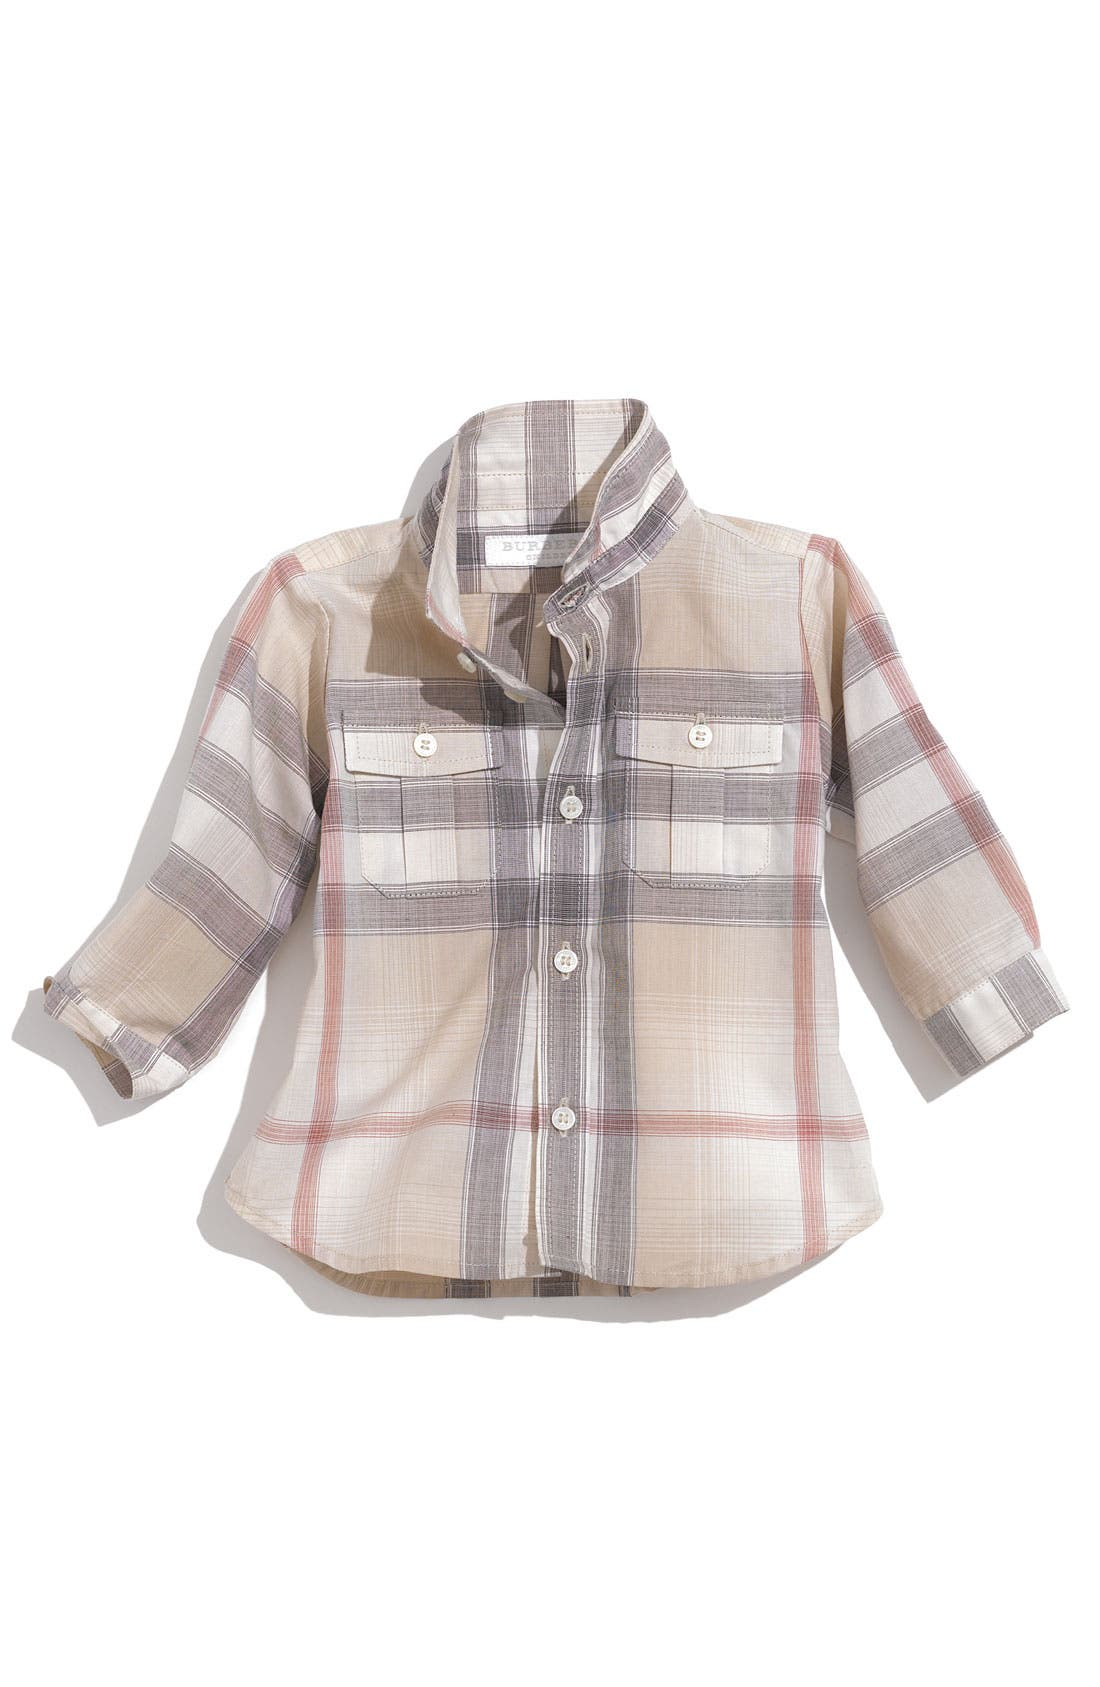 Main Image - Burberry Check Shirt (Infant)